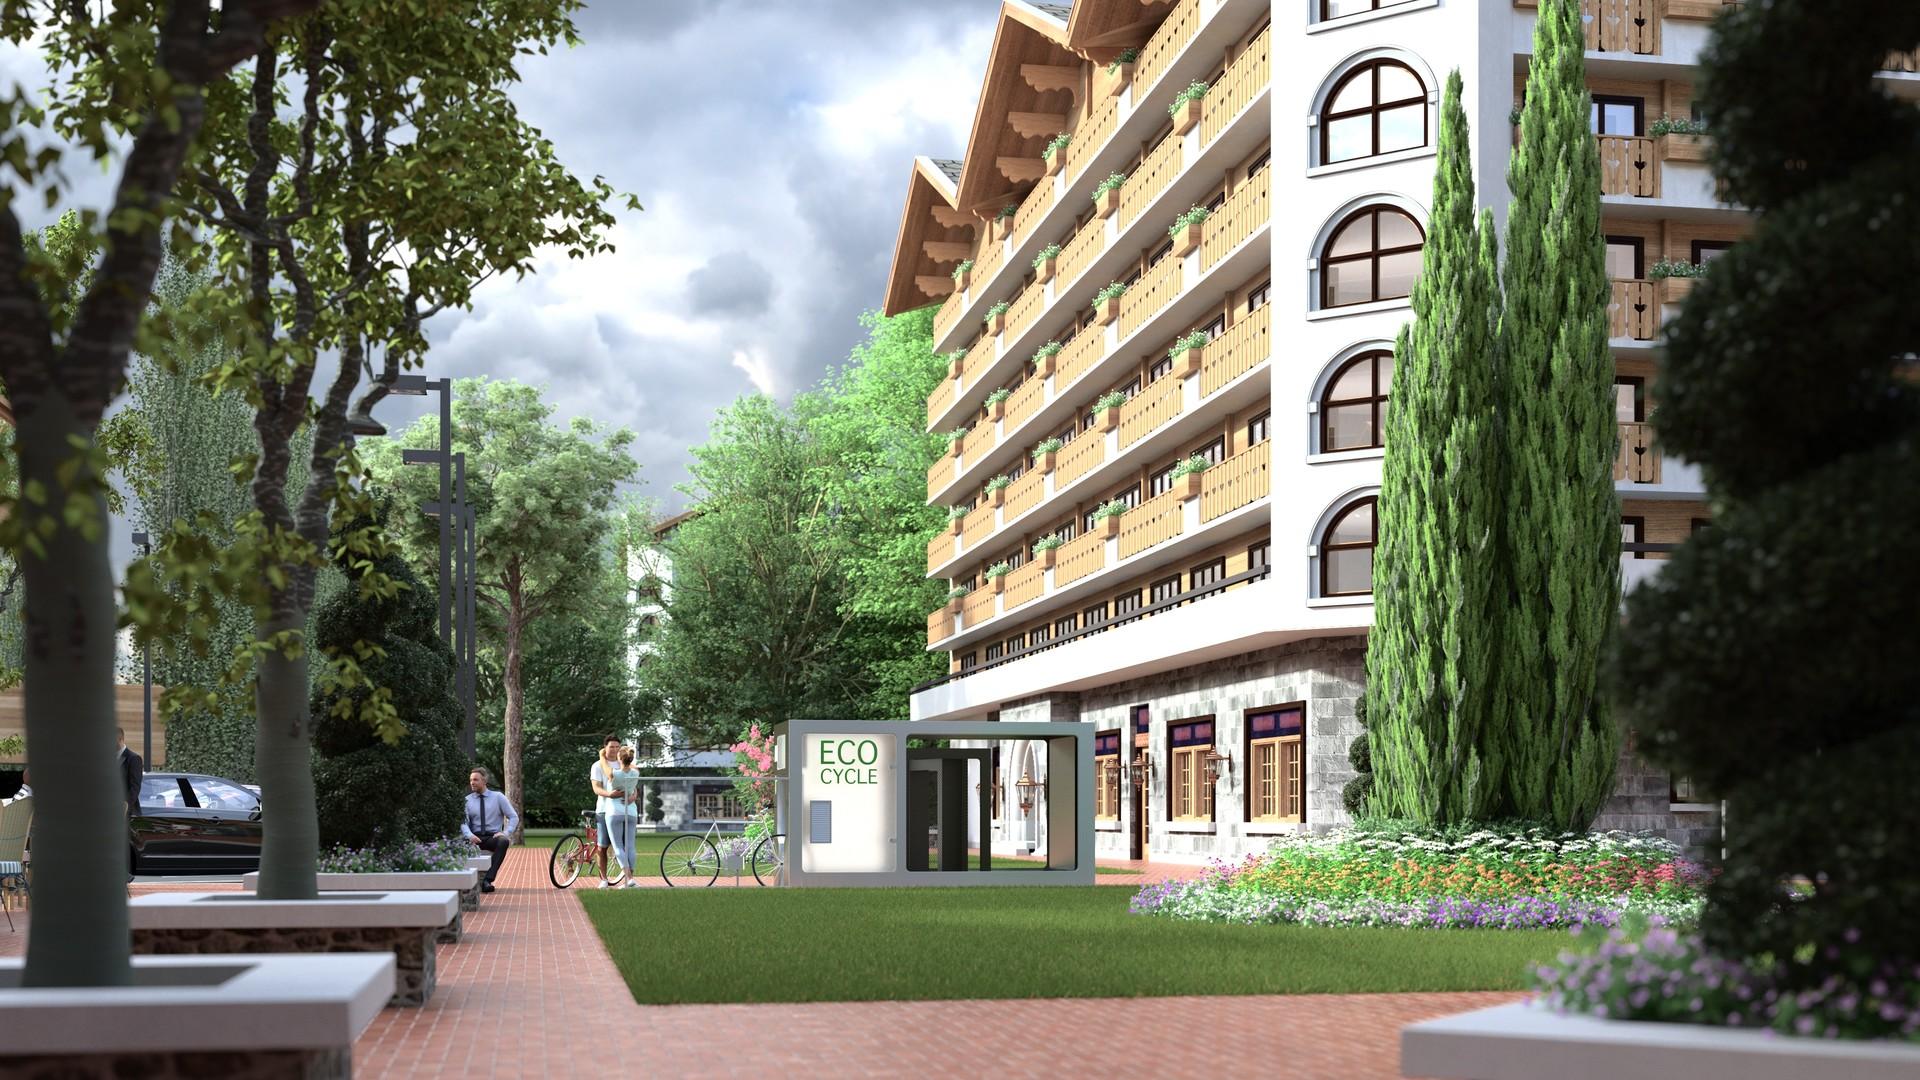 Duane kemp 02 eco cycle alpine hotel v2017 scene 87 3840x2160 5h07m hdr241 vignet 5 fp2900zg crf b